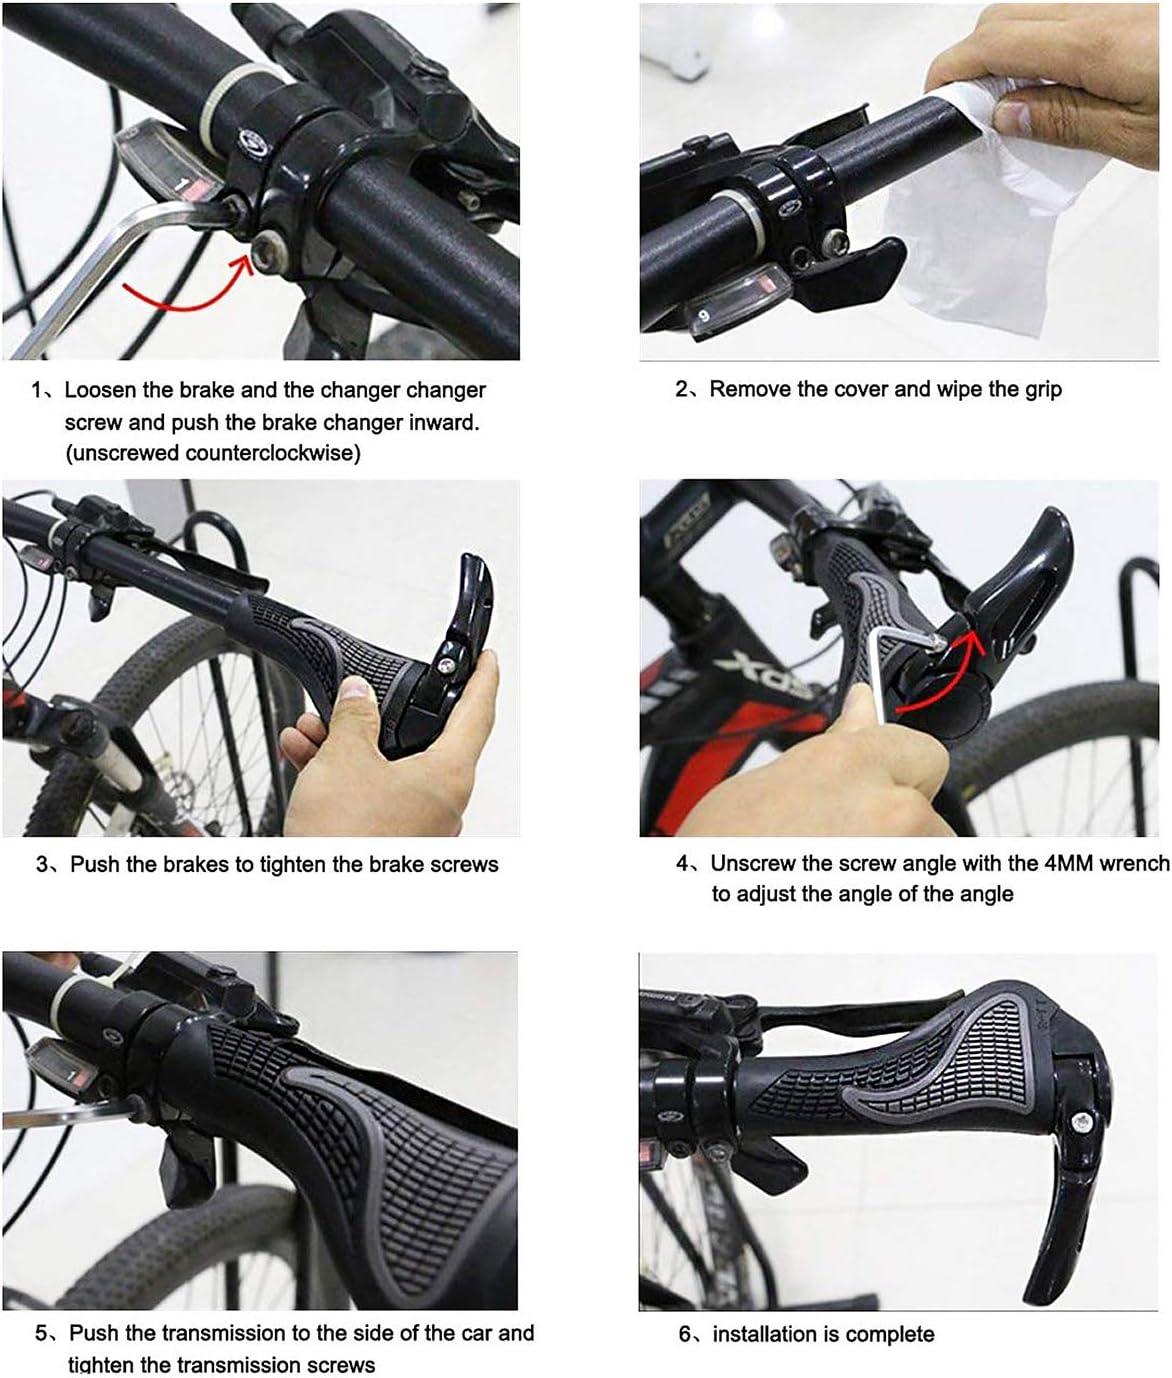 Mango de Goma Antideslizante para Empu/ñadura de Bicicleta con Cerradura de Aluminio PROZADALAN Pu/ños para Bicicletas con M/áscara de Camuflaje Pu/ños de Bicicleta para Bicicleta//Bicicleta de Monta/ña